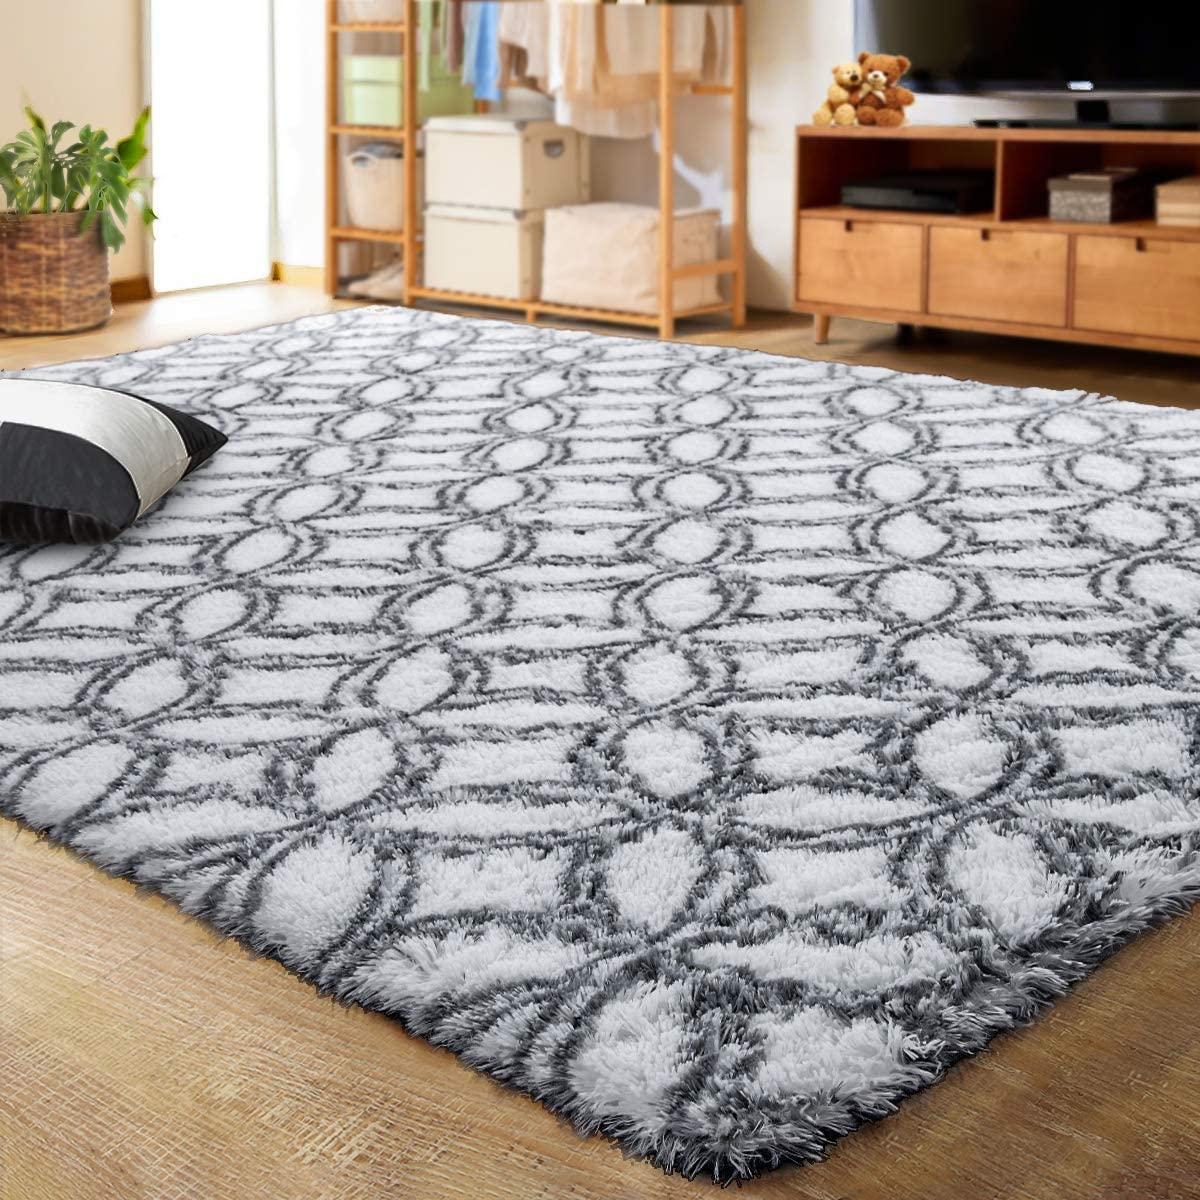 LOCHAS Luxury Velvet Shag Area Rug Mordern Indoor Plush Fluffy Rugs, Extra Soft and Comfy Carpet, Geometric Moroccan Rugs for Bedroom Living Room Girls Kids Nursery (4x6 Feet, Grey/White)